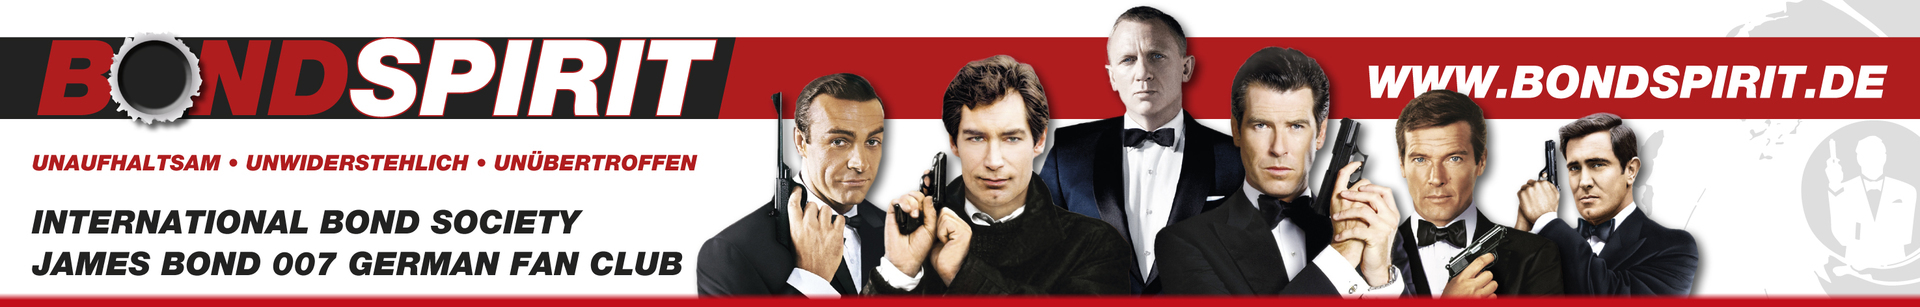 Bondspirit, International Bond Society, James Bond 007 German Fan Club